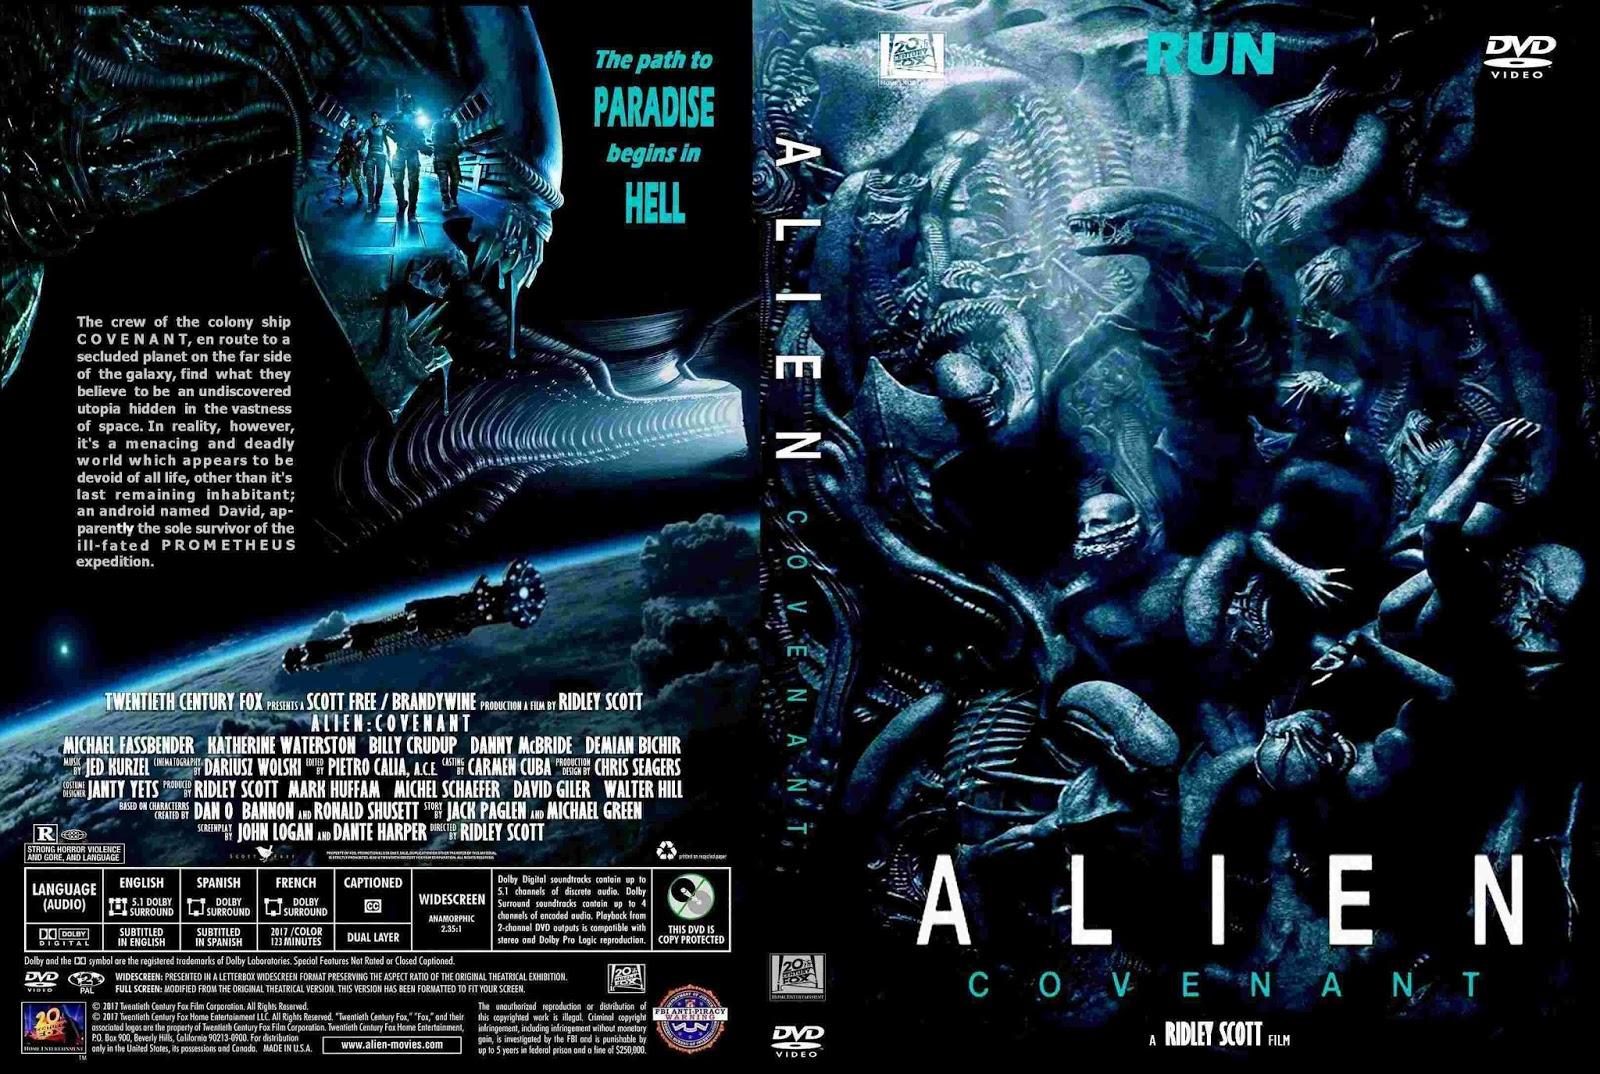 Resultado de imagem para ALIEN COVENANT CAPA DVD